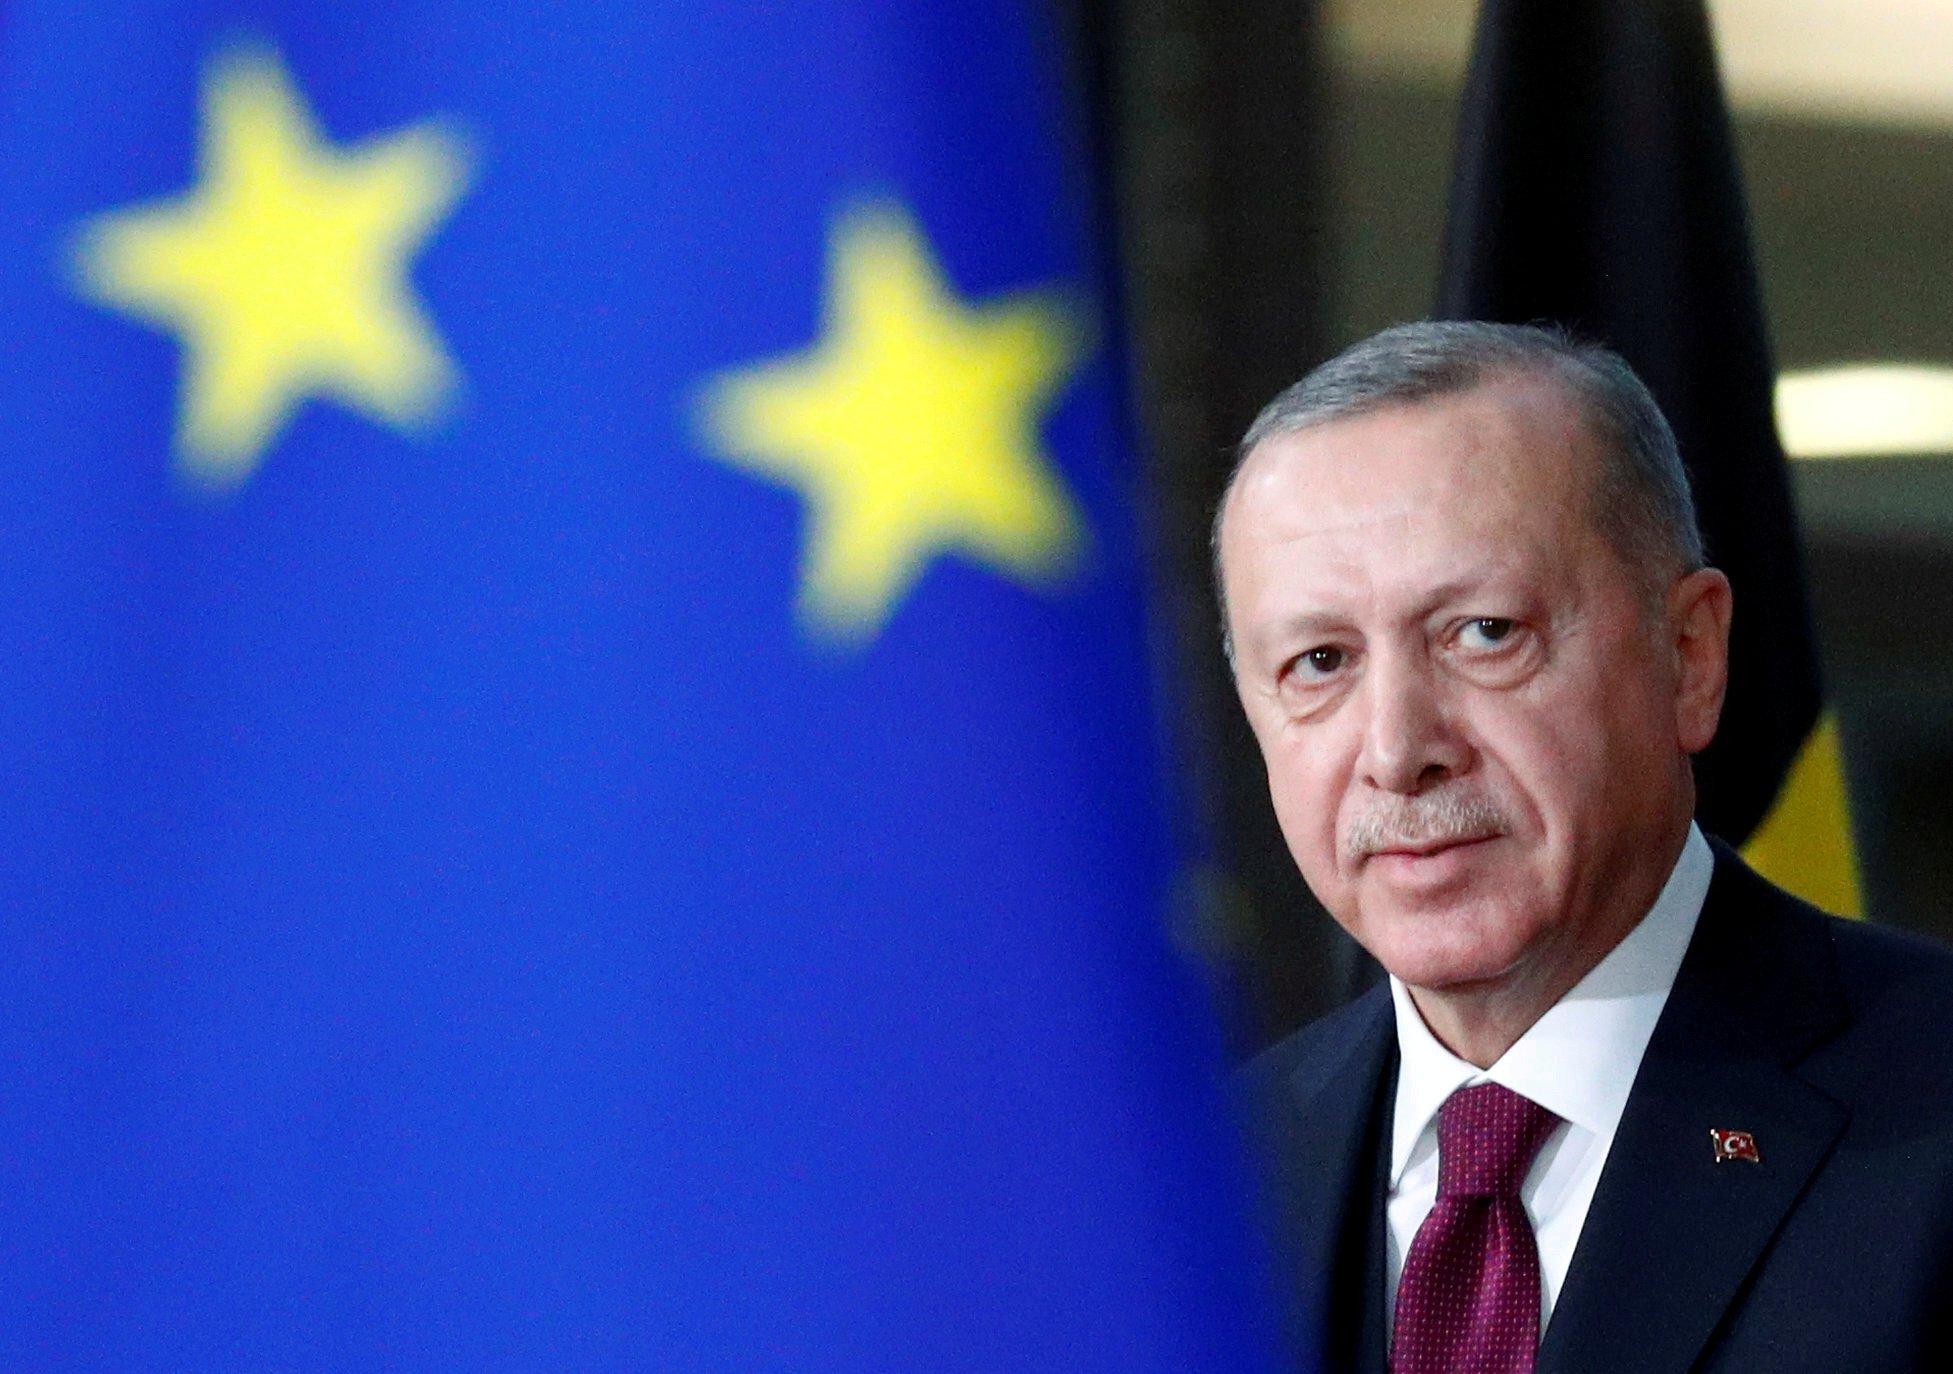 Turkey expects concrete steps from EU on East Med, Erdoğan tells Michel